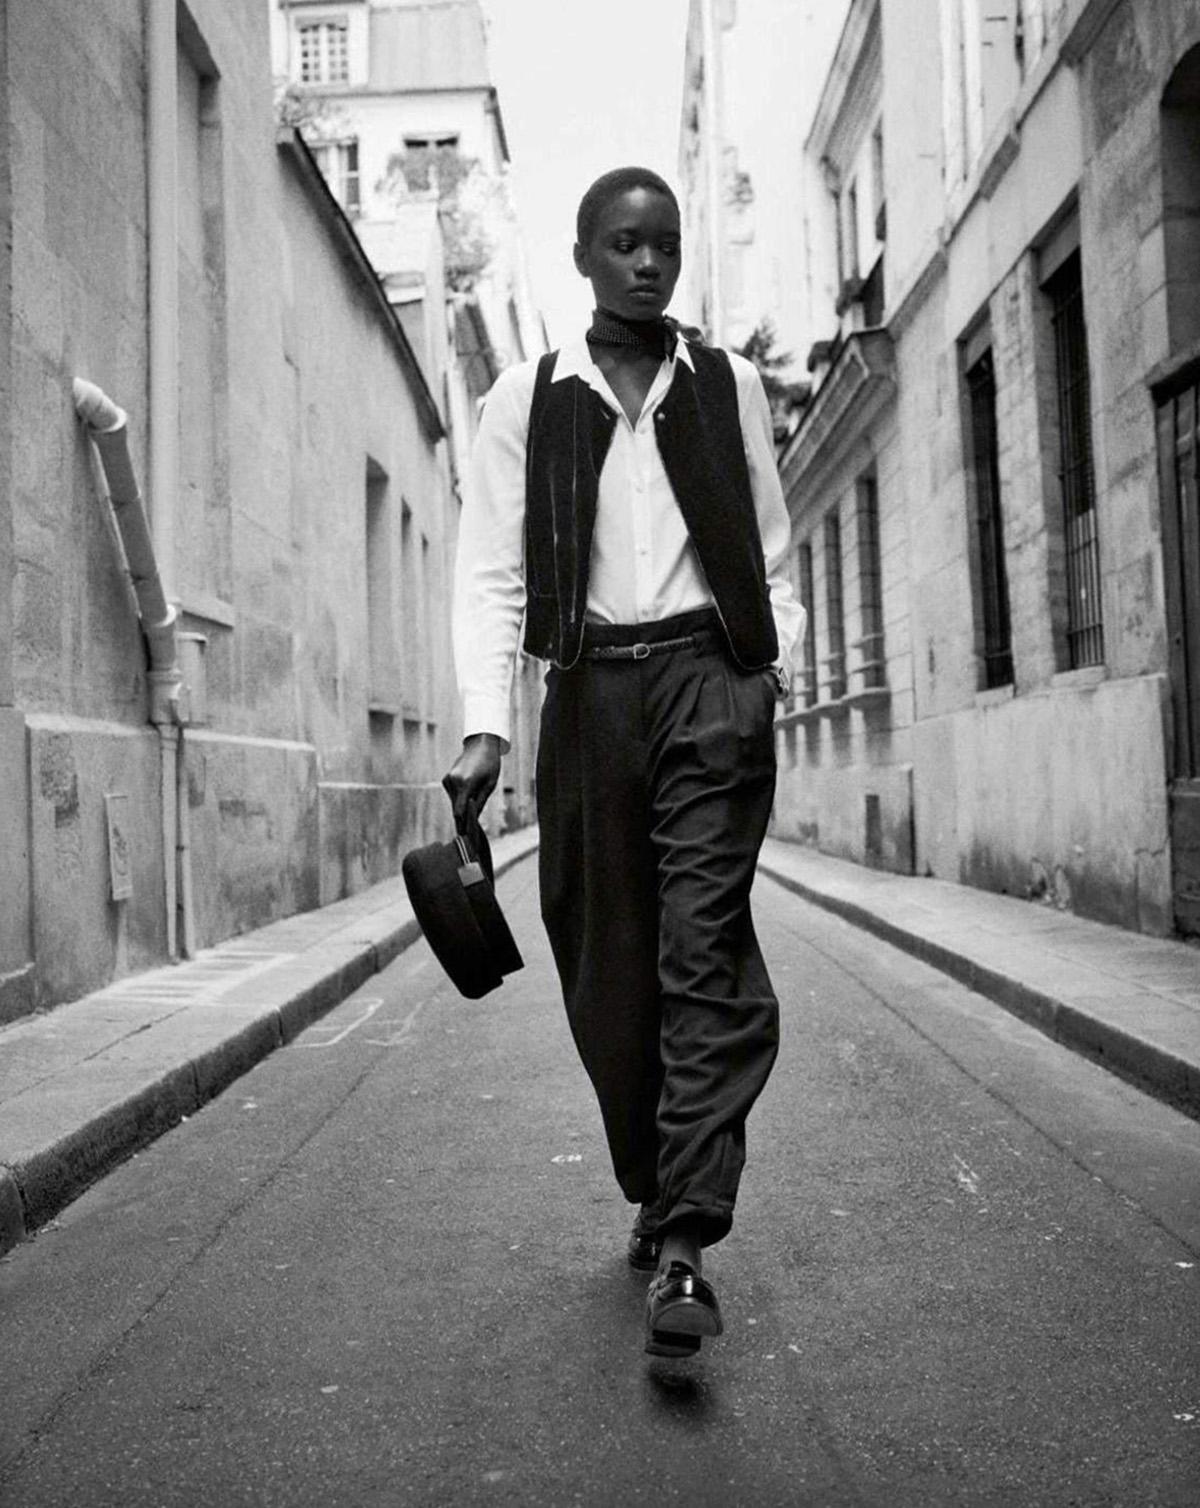 Maty N'diaye by Jan Welters for Elle France September 17th, 2021